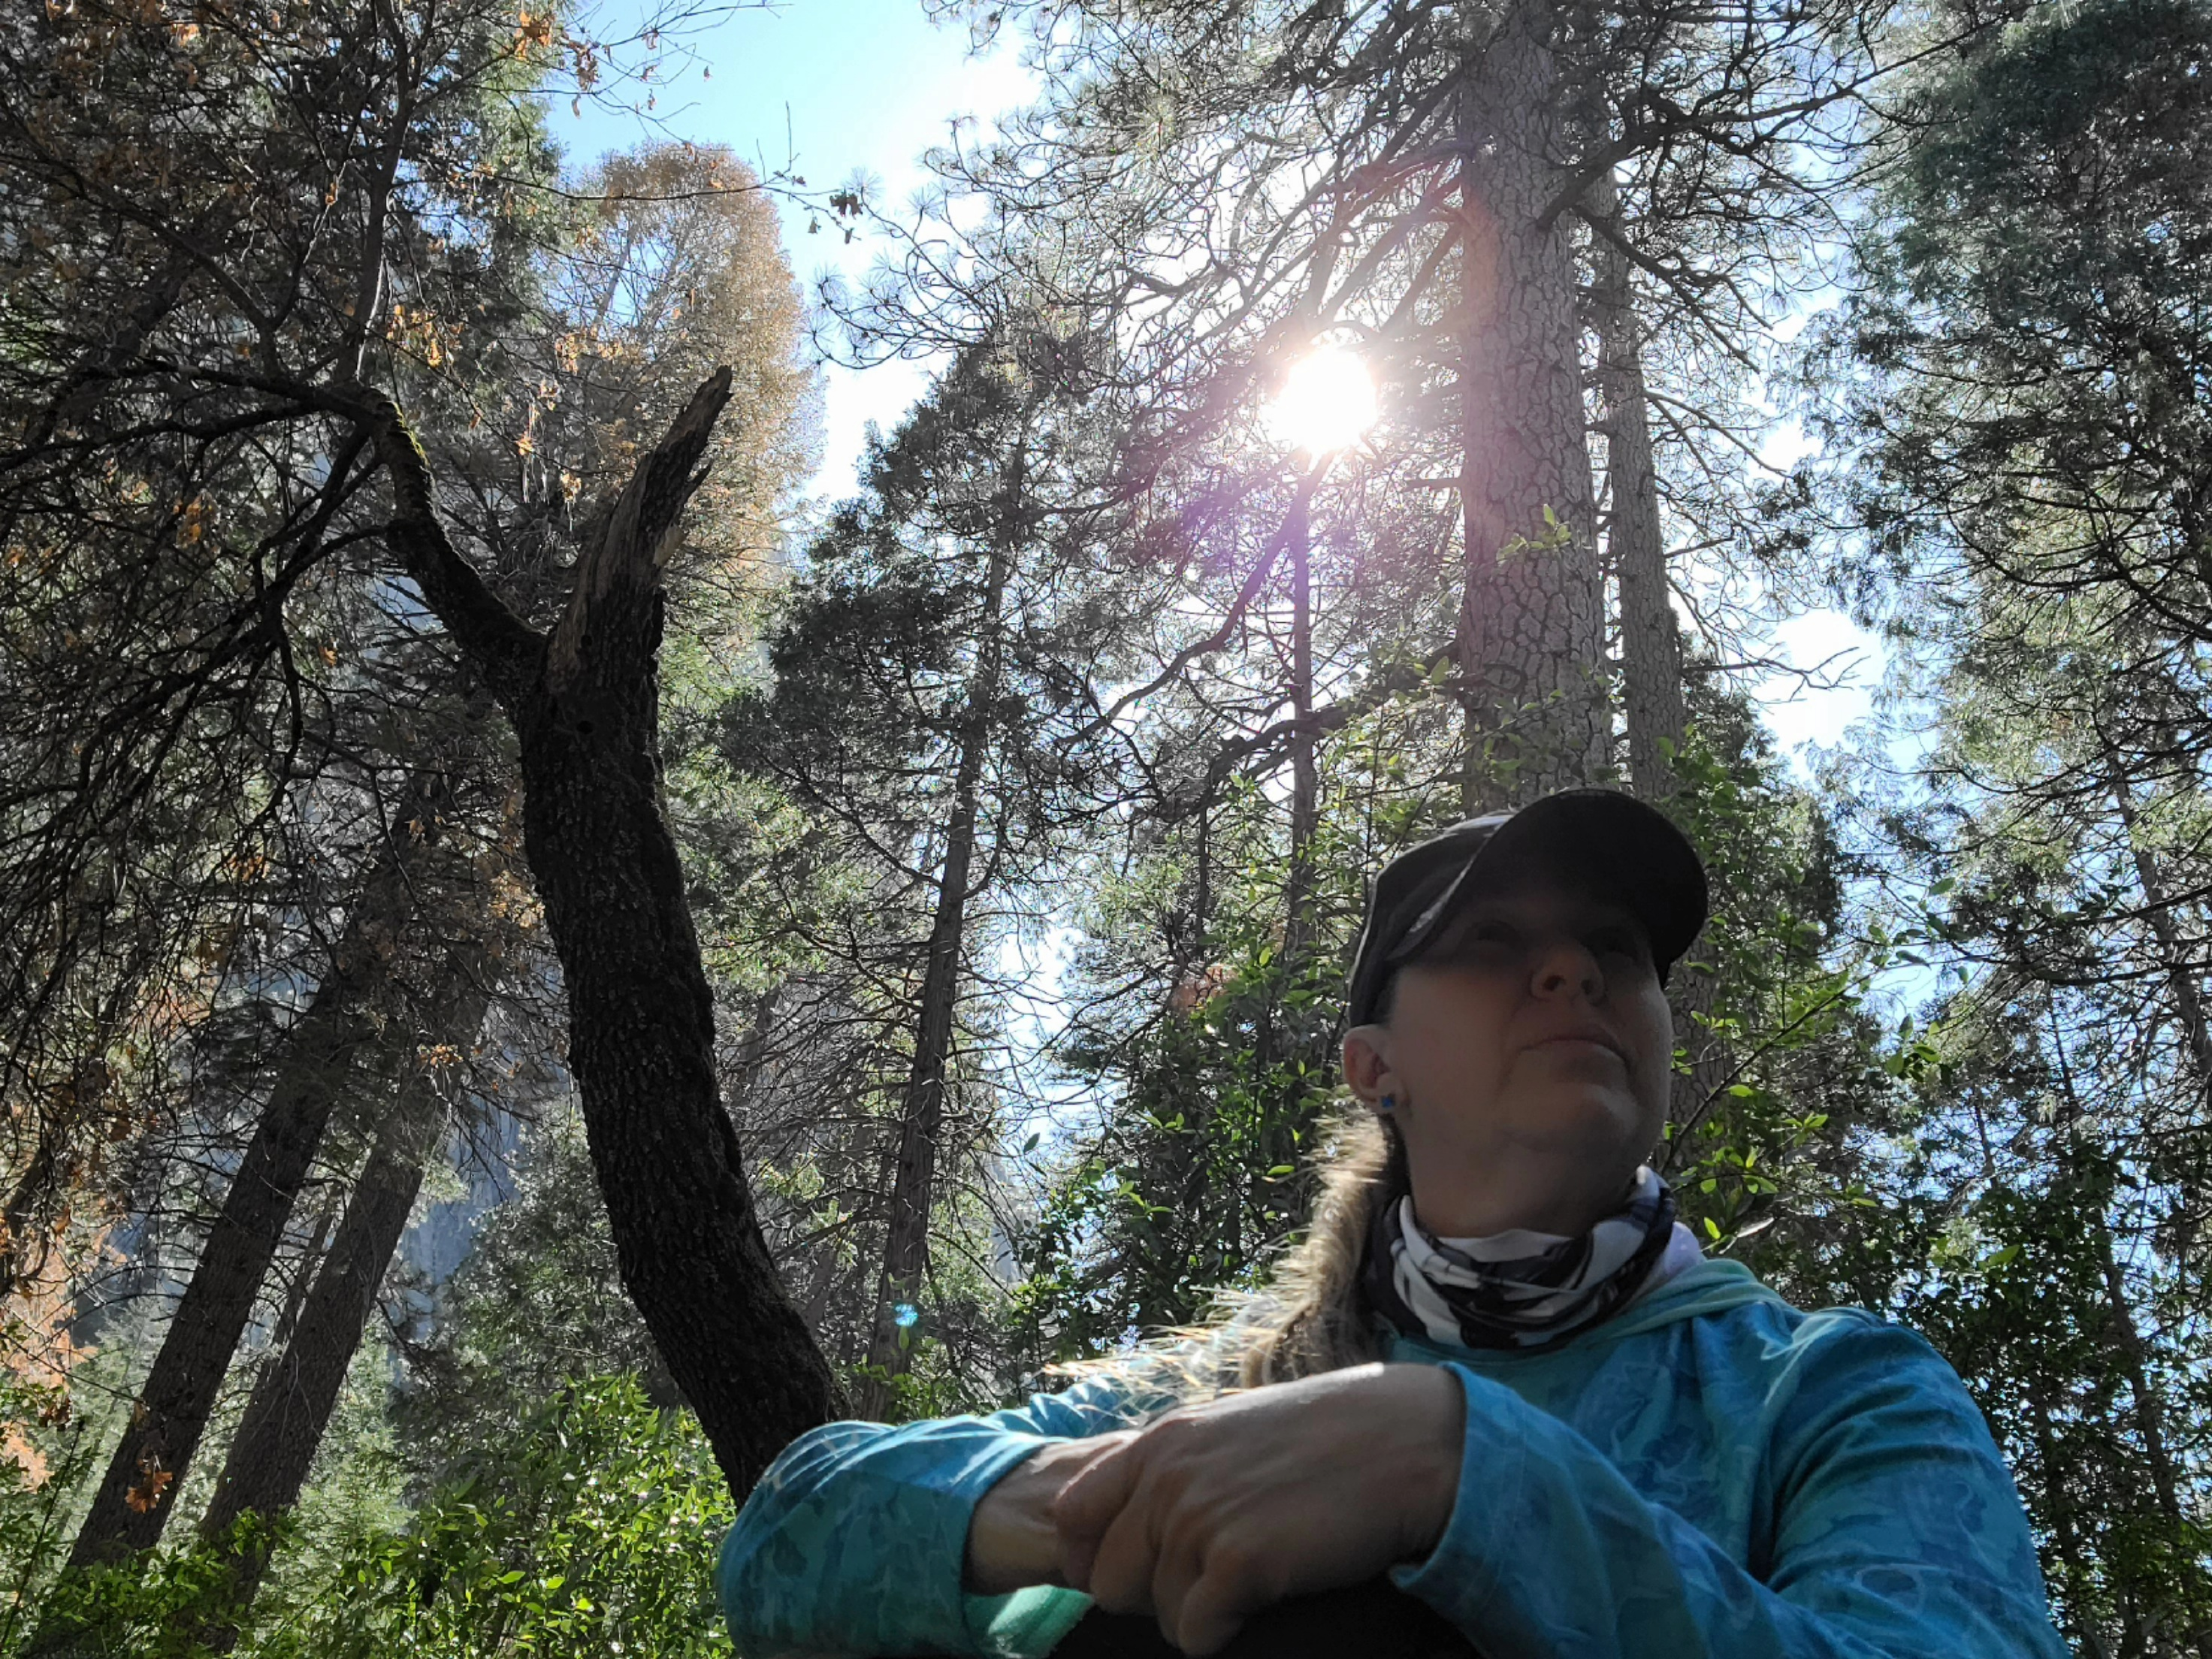 Tanisha Garcia in Yosemite on a hike.